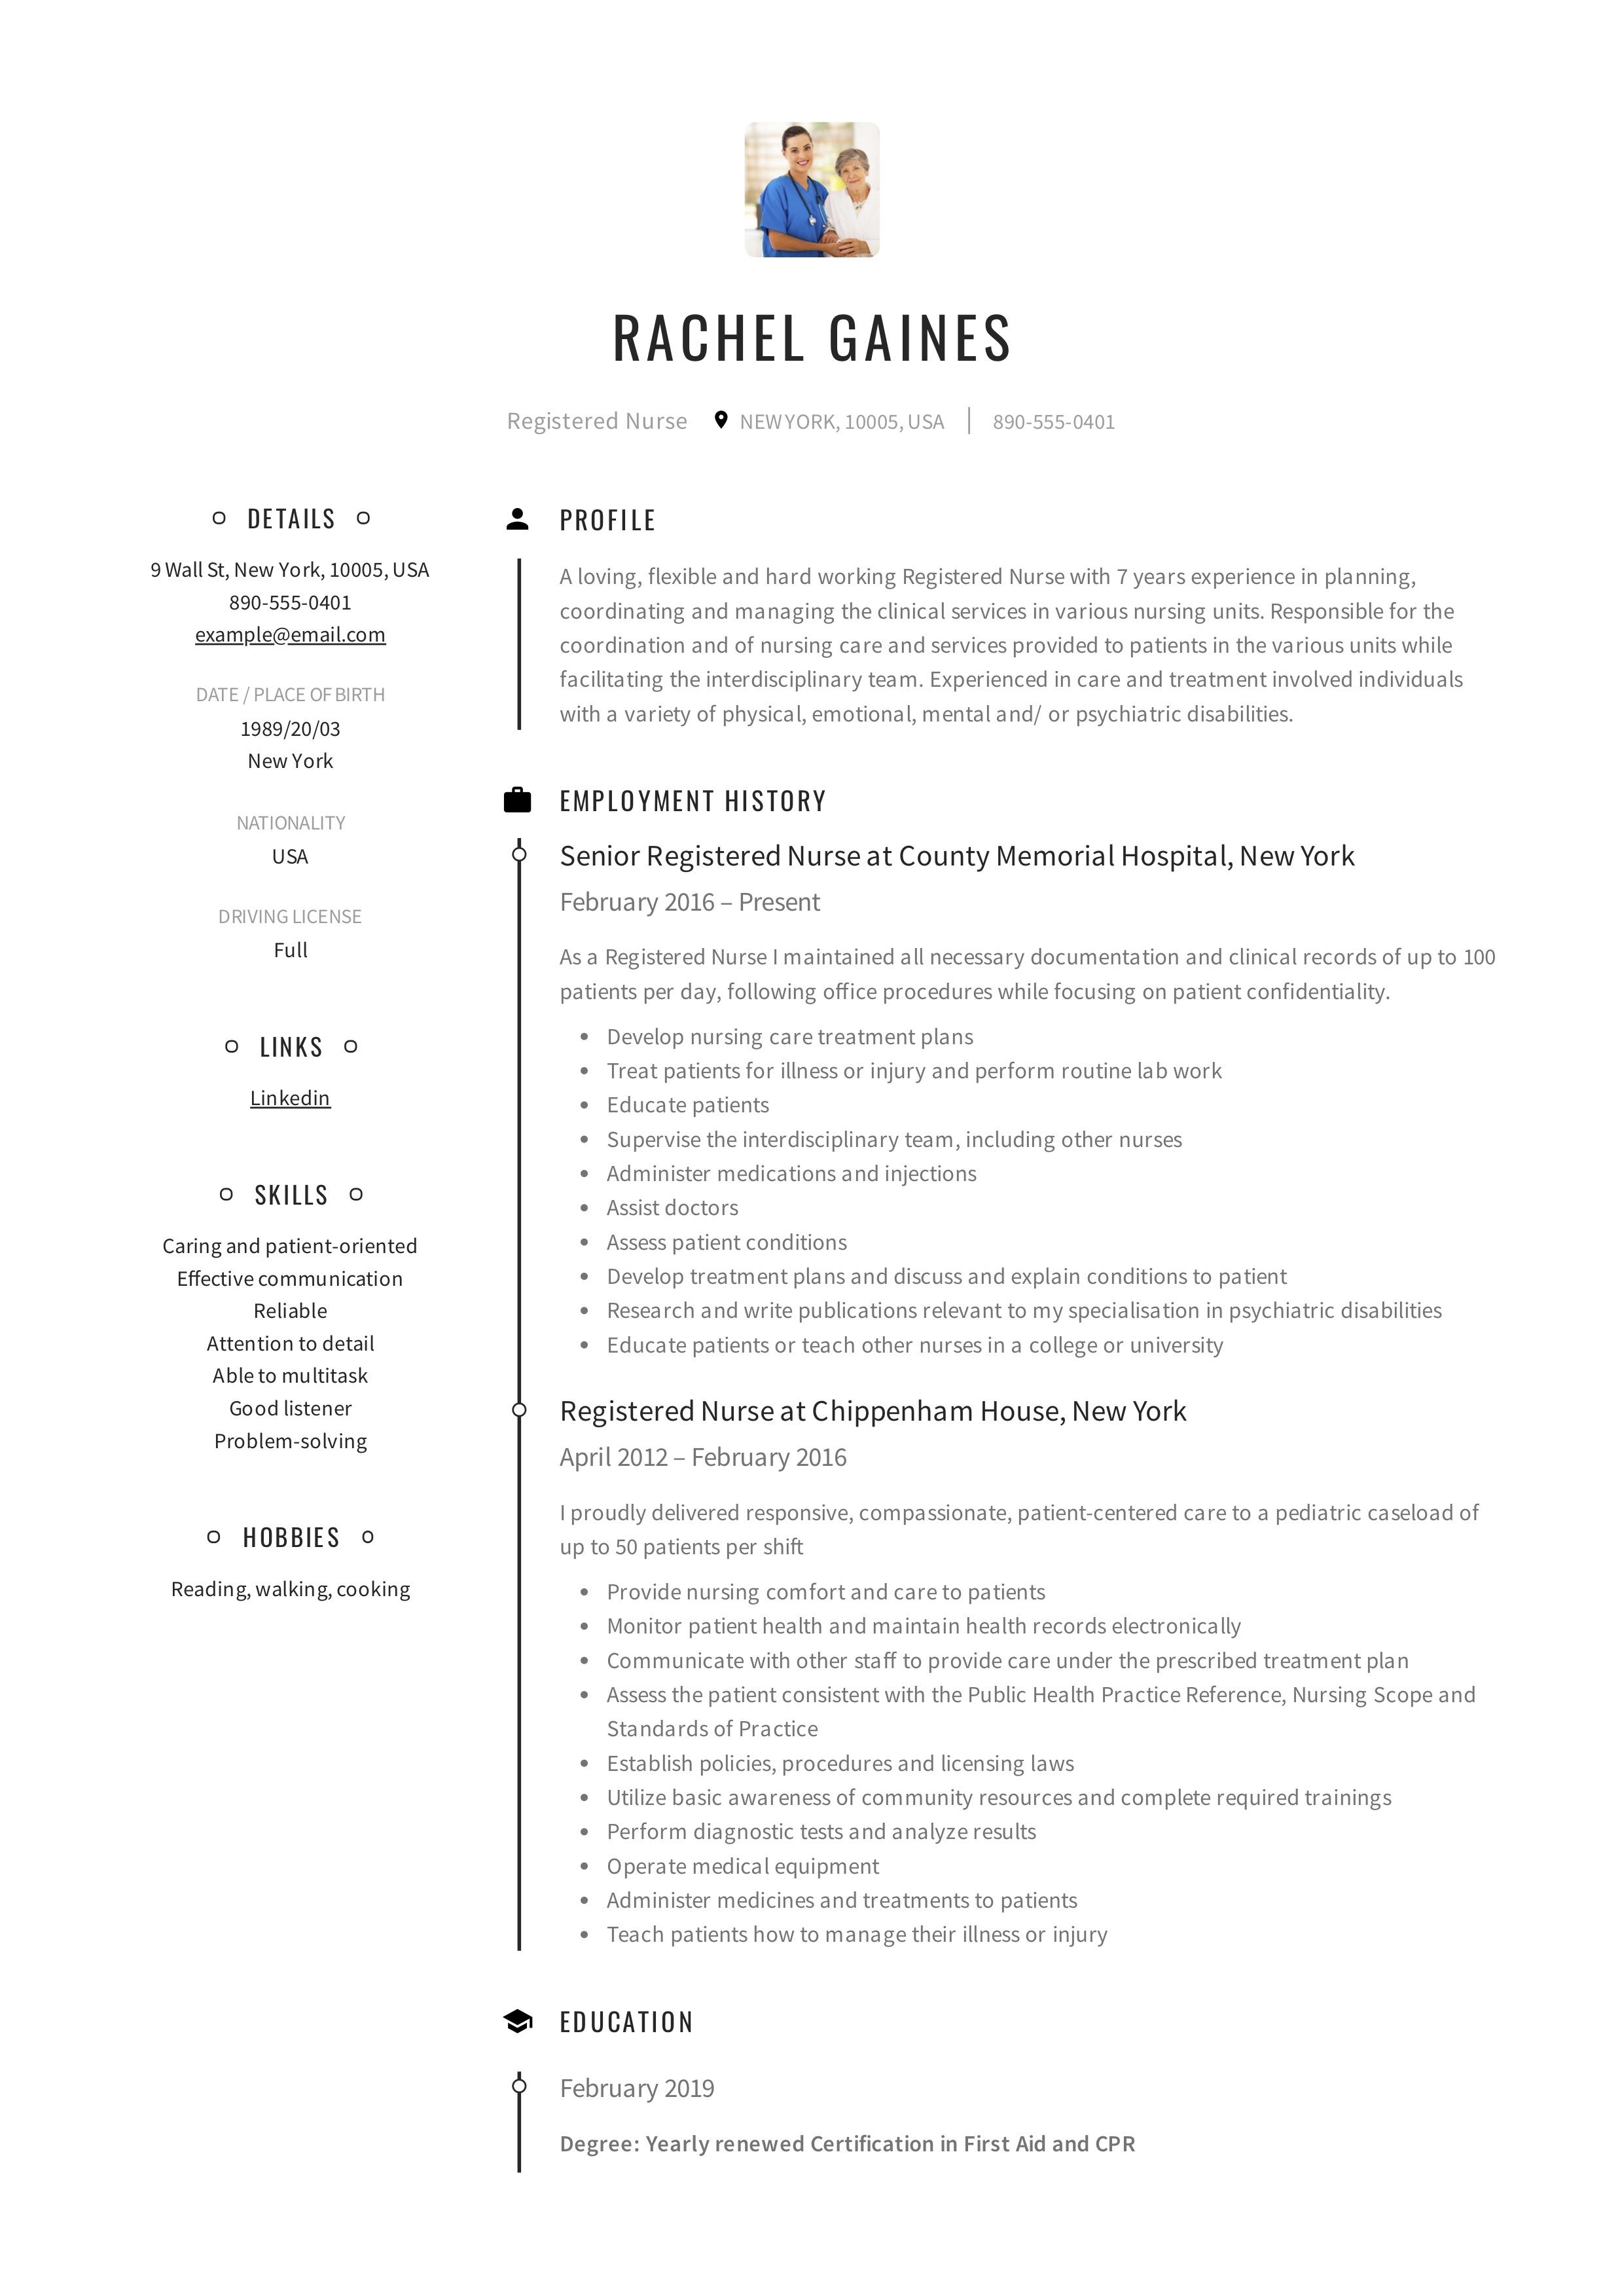 Registered Nurse Resume Sample Amp Writing Guide 12 Samples PDF